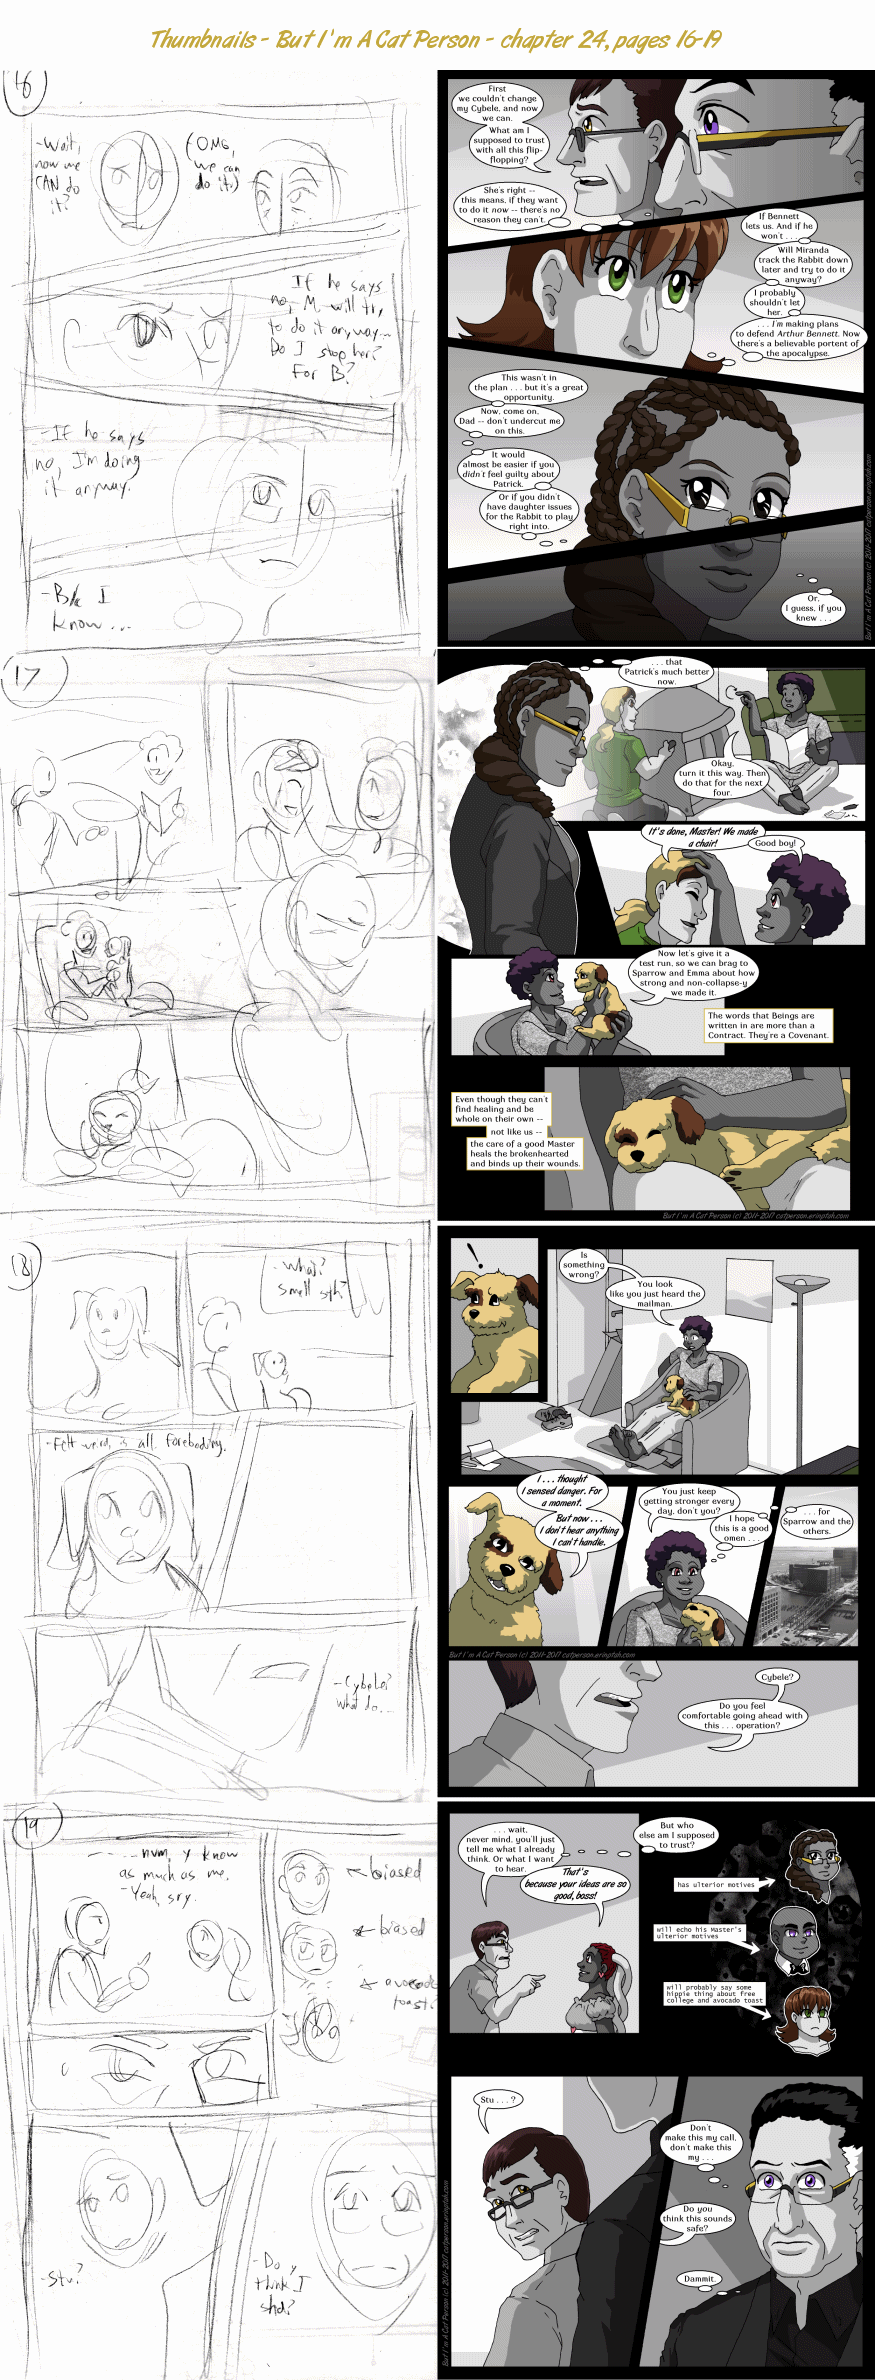 Bonus: Chapter 24 Thumbnails